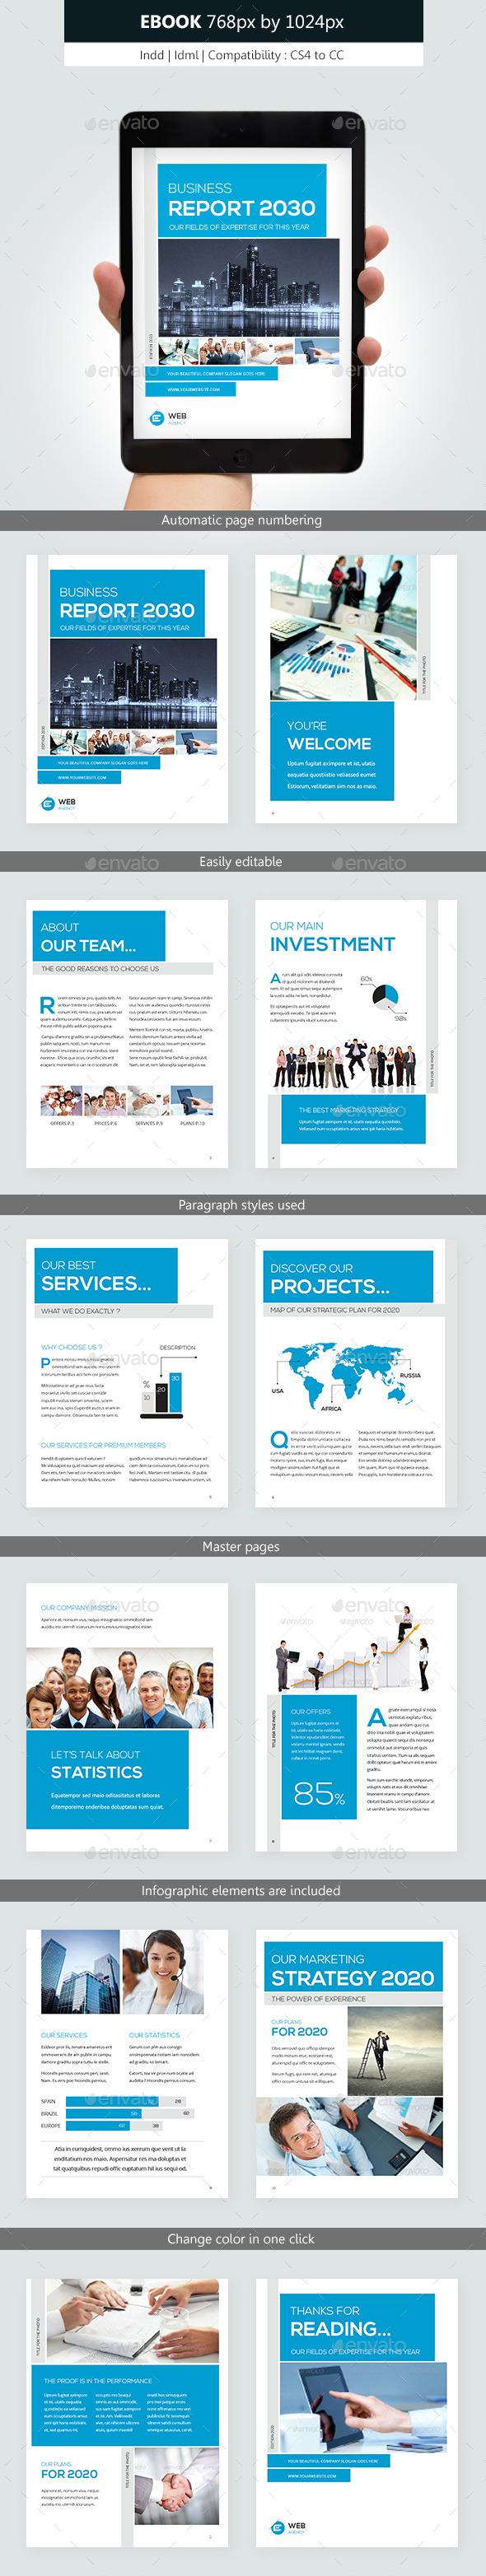 Corporate Ebook Template Design by franceschi_rene | GraphicRiver